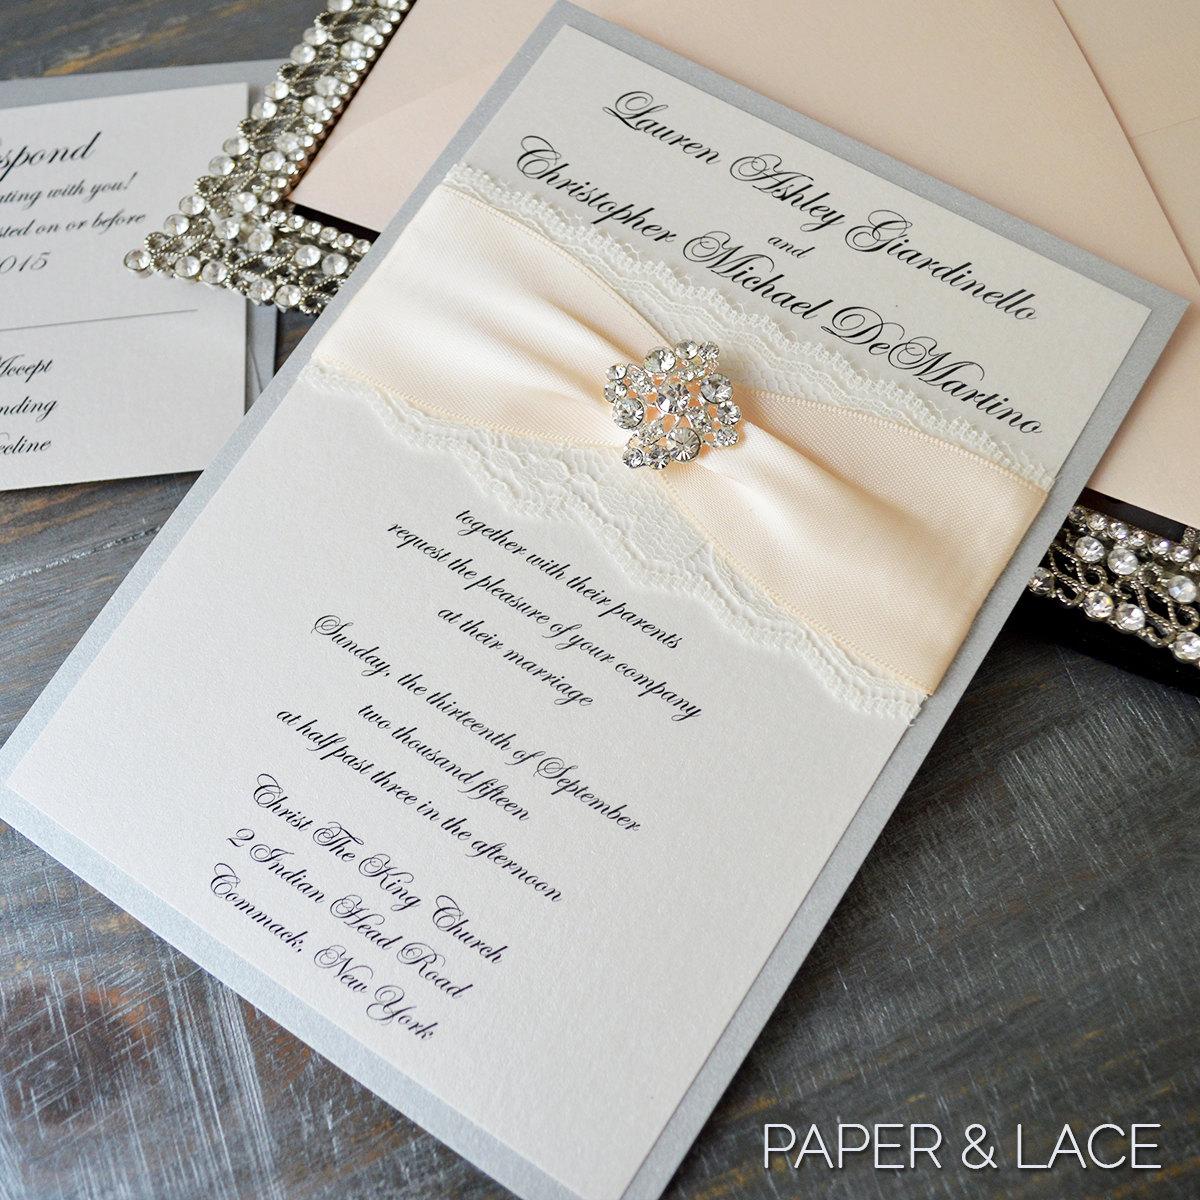 Silver Wedding Invitations: LAUREN Vintage Lace Wedding Invitation Silver And Blush